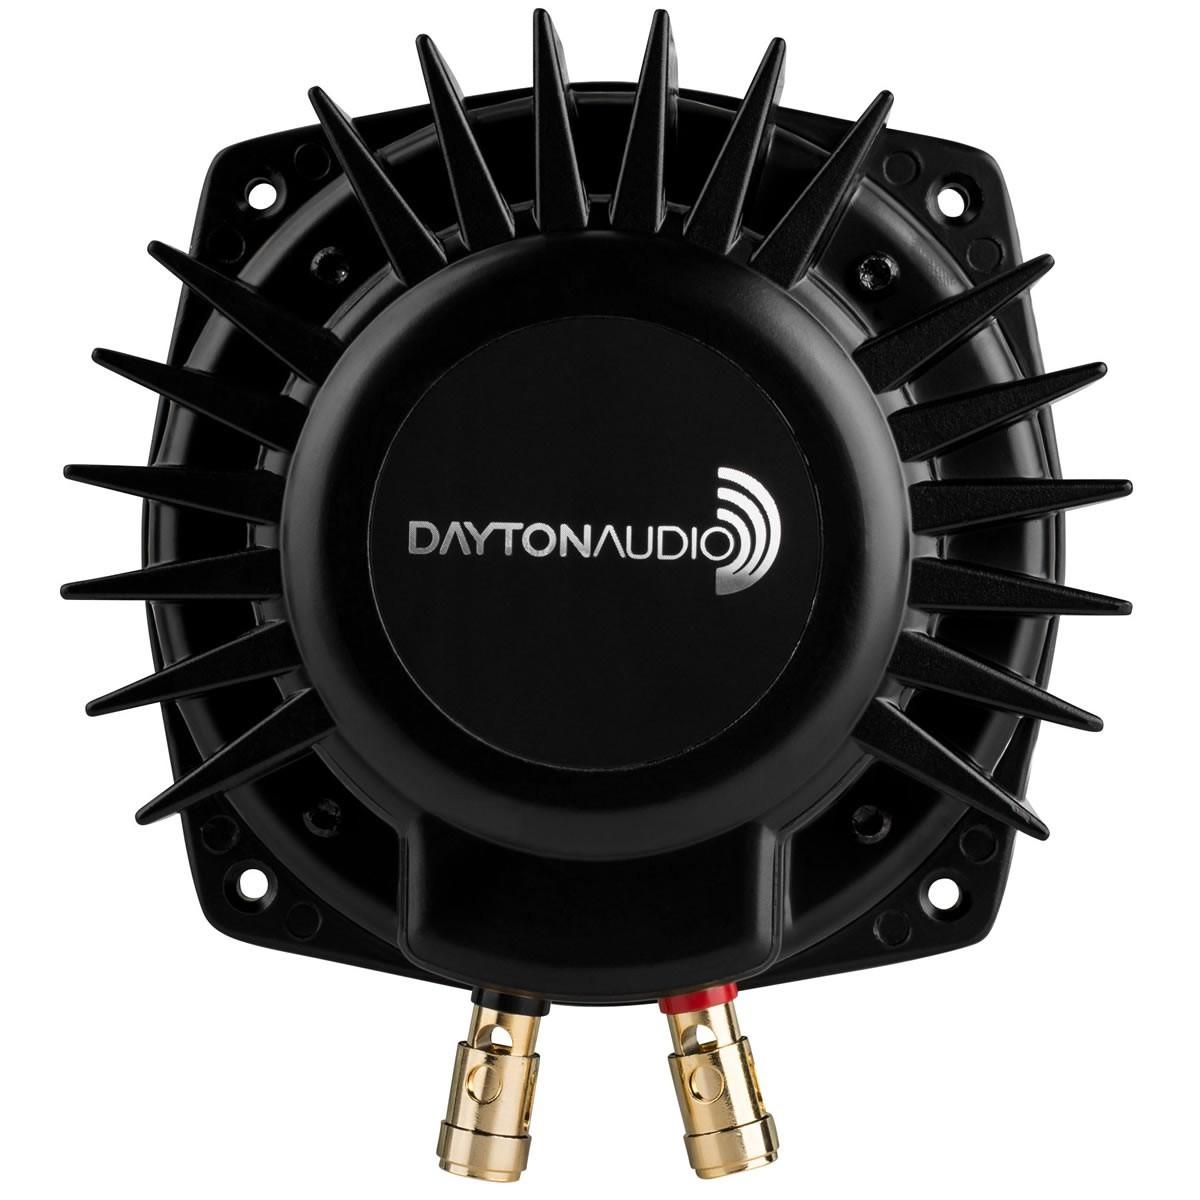 DAYTON AUDIO BST 1 Bass Shaker Vibreur 50 W 4 Ohm